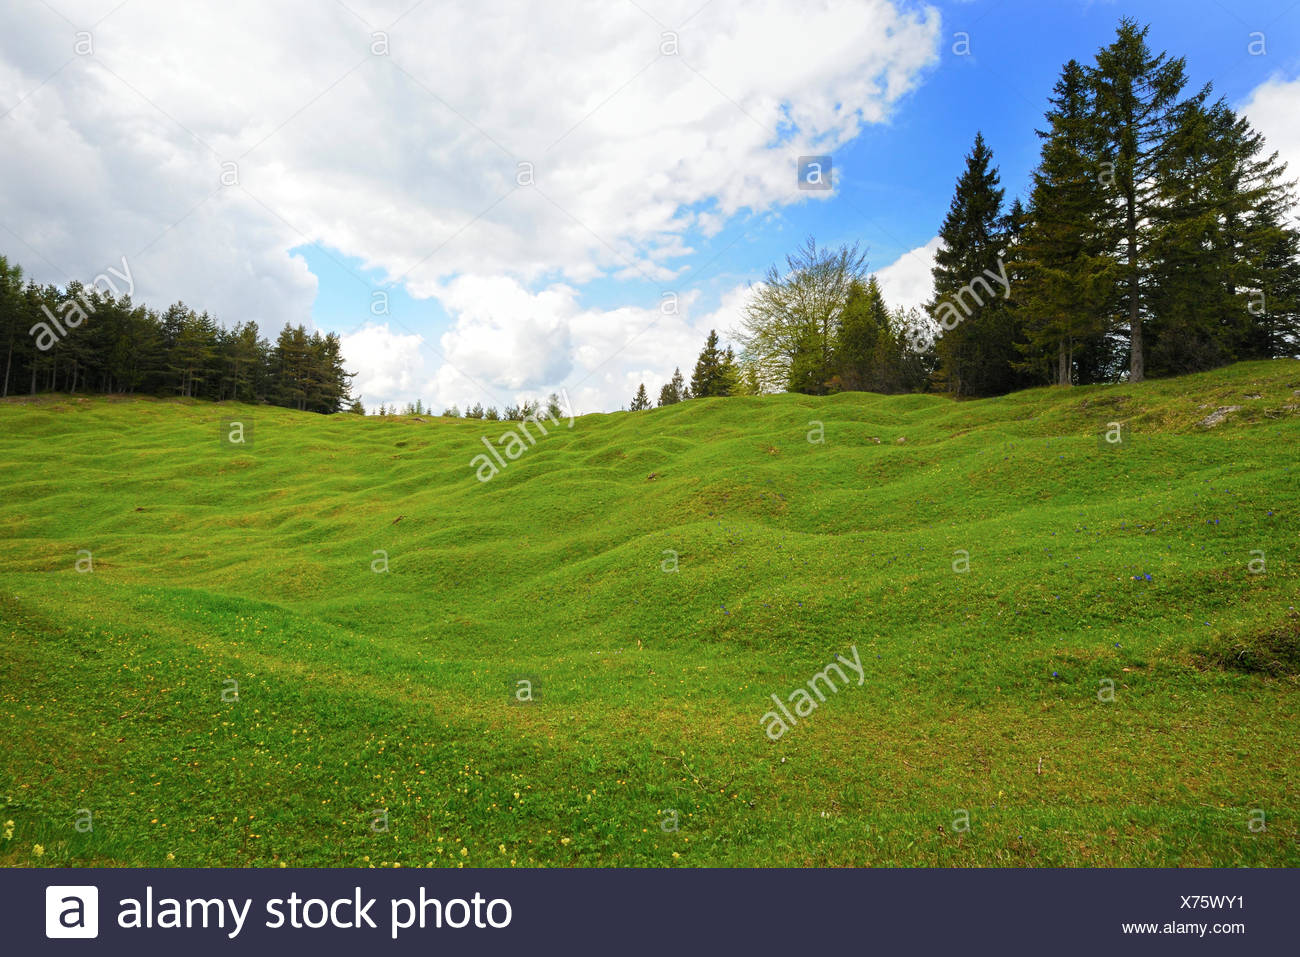 Hump meadows at Kranzberg, Karwendel Mountains, Mittenwald, Werdenfelser Land, Upper Bavaria, Bavaria - Stock Image